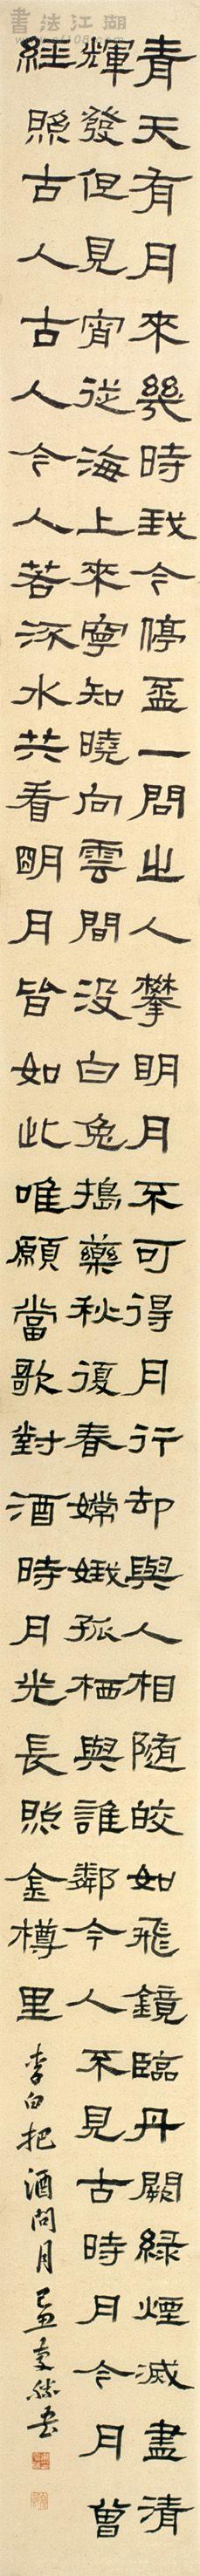 Scan003副本.jpg